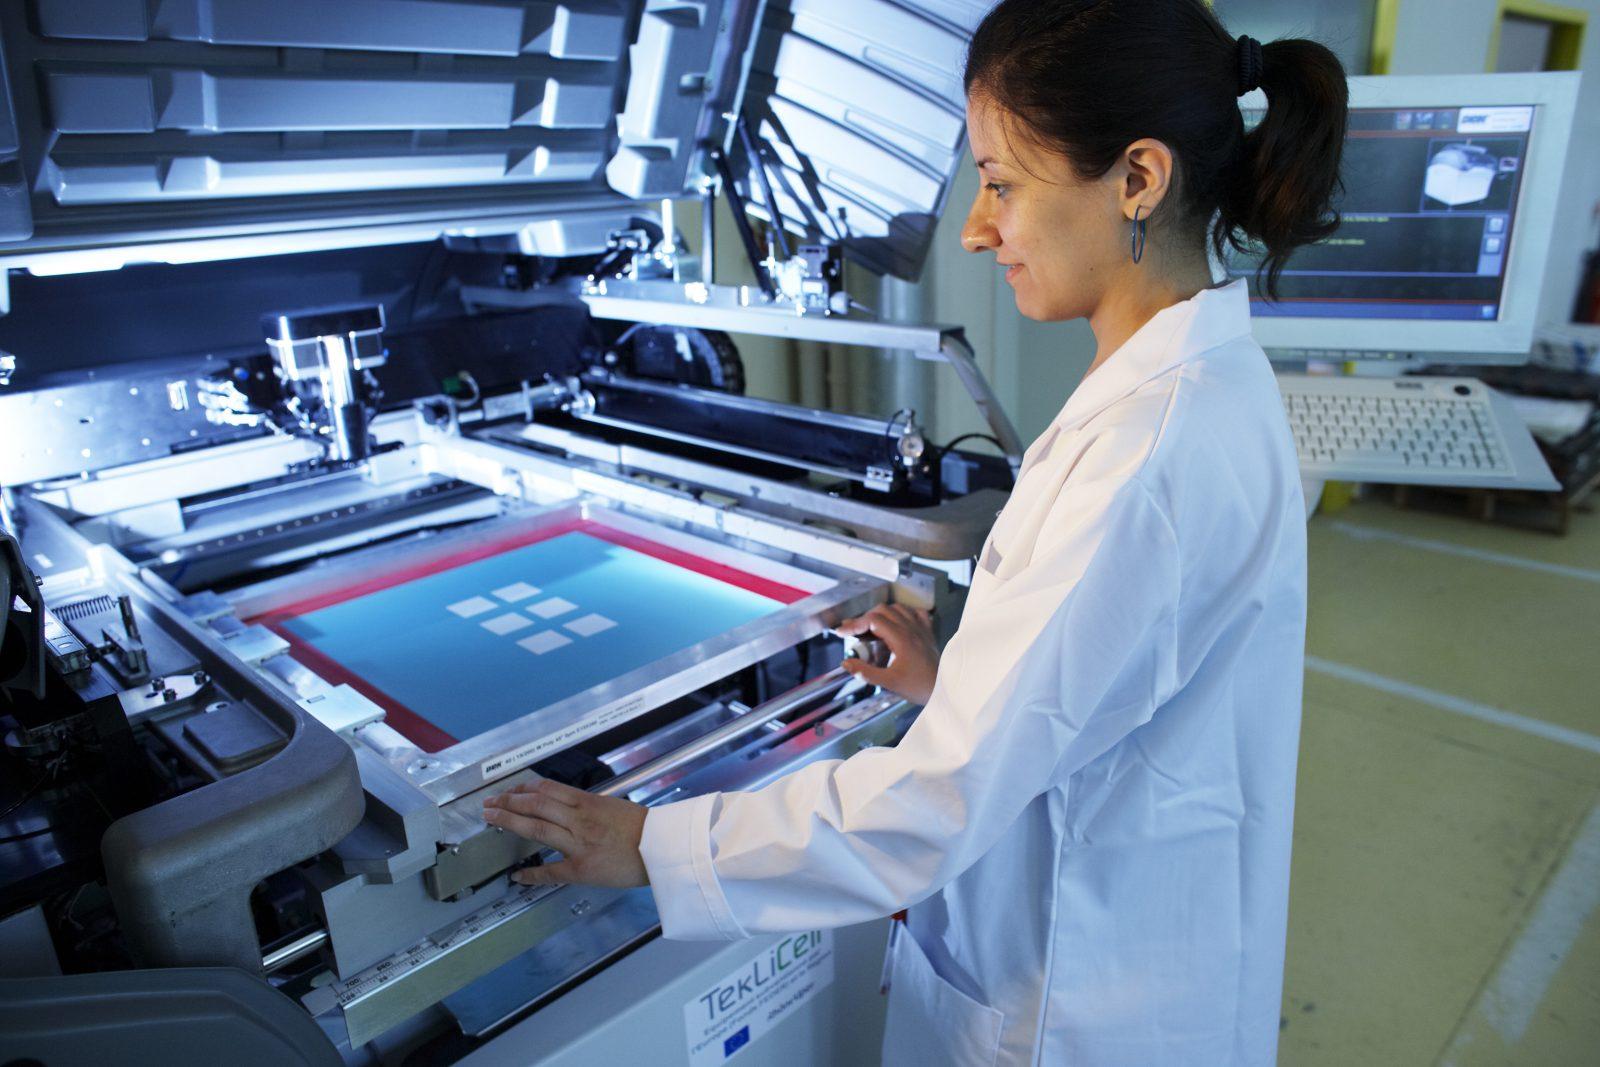 Plateformes technologiques Teklicell